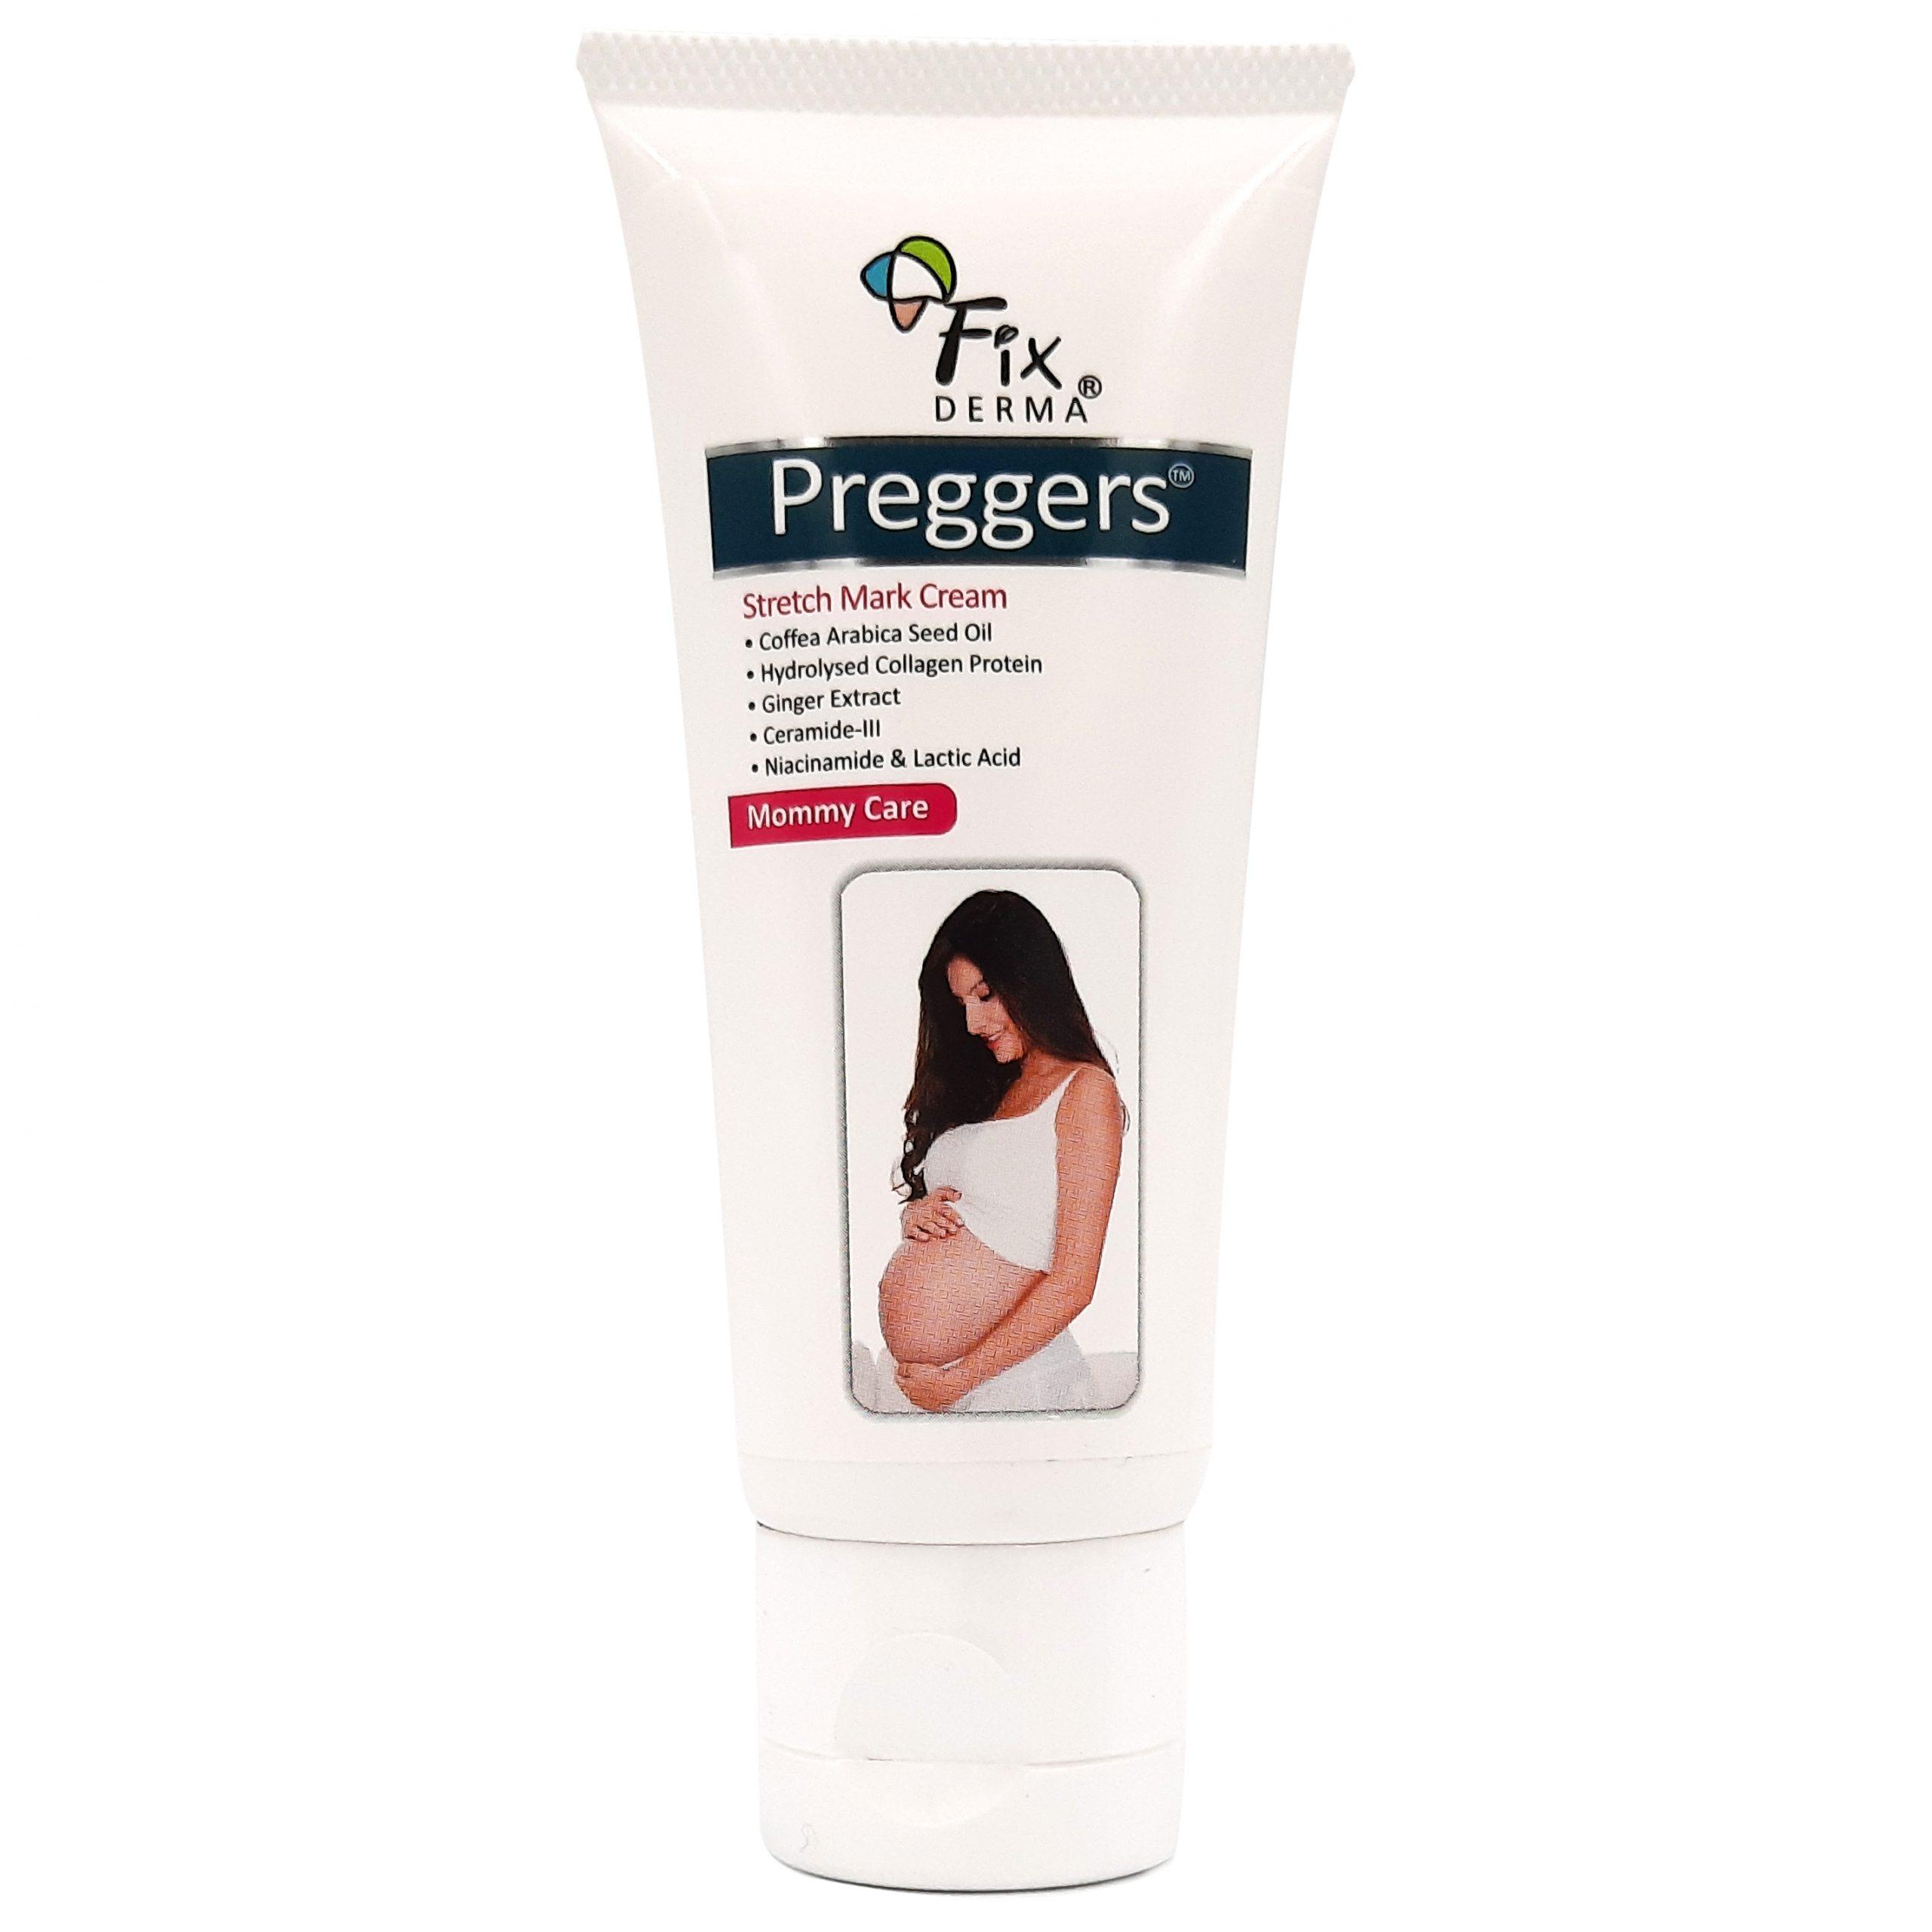 Kem Dưỡng Ẩm, Mềm Da, Mờ Vết Rạn Fixderma Preggers Stretch Mark Cream 60g